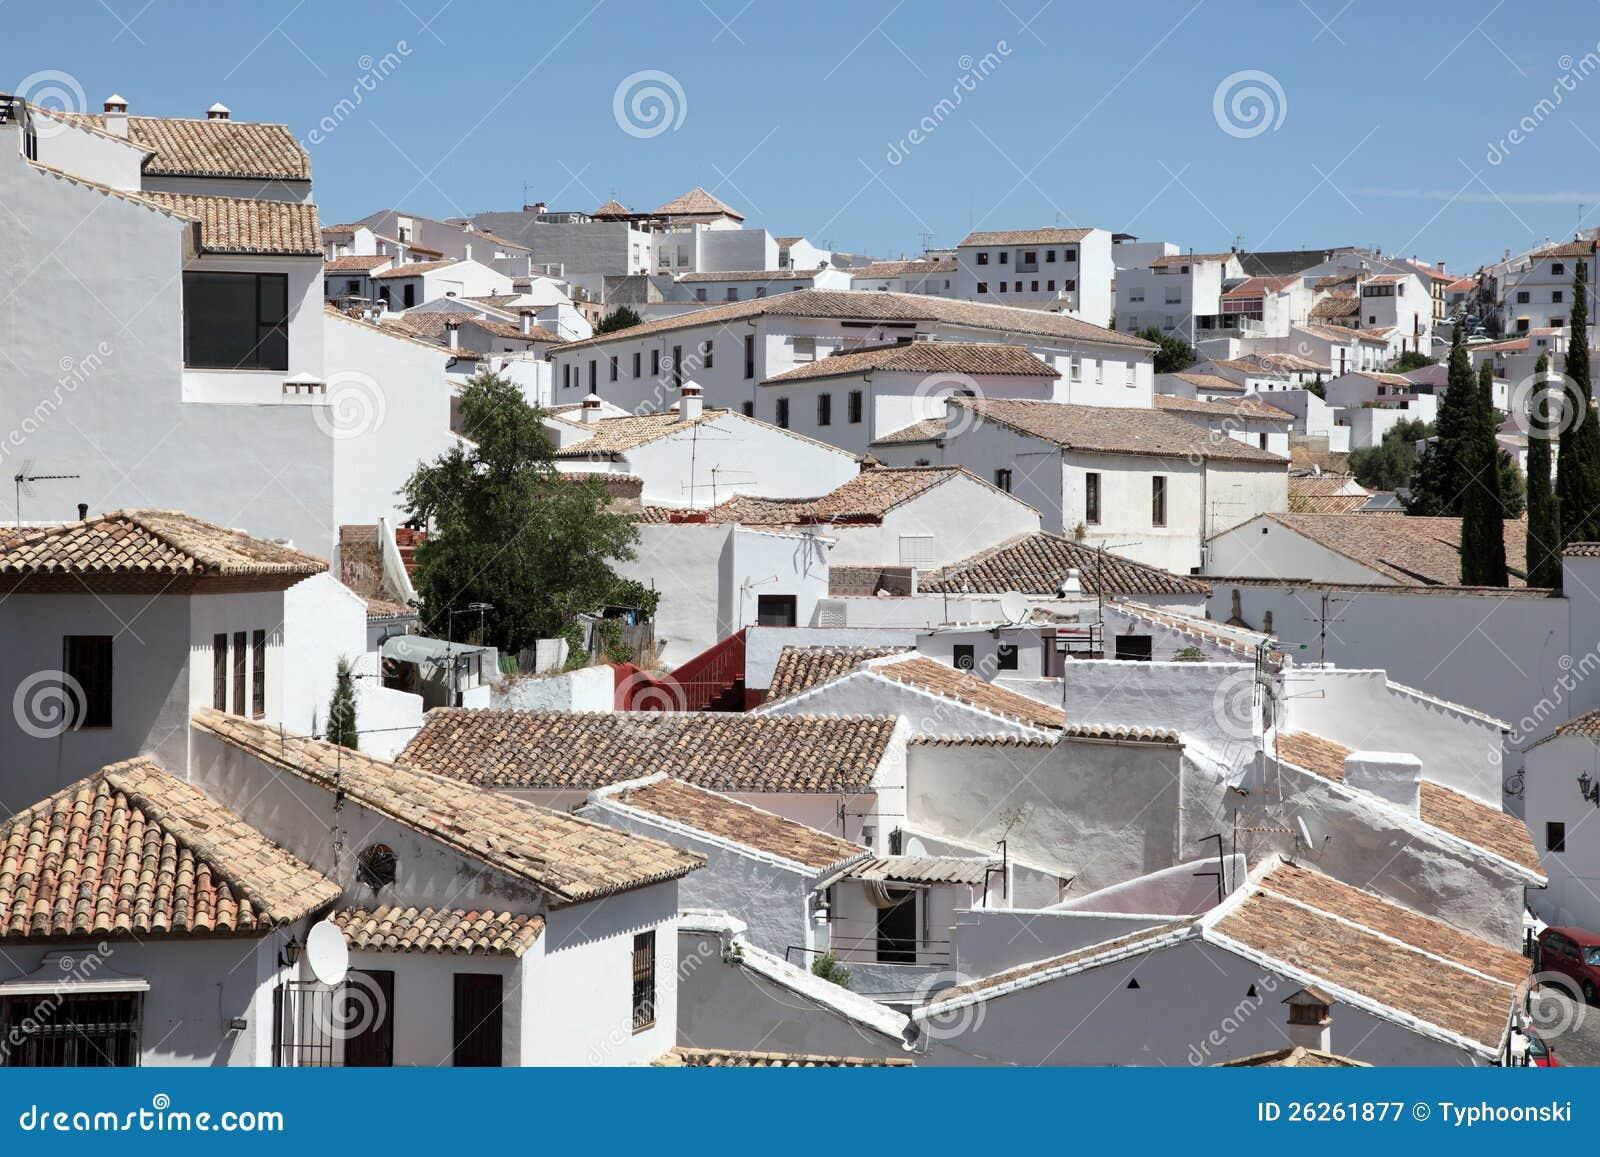 Casas blancas en ronda espa a fotograf a de archivo libre - Casas sostenibles espana ...